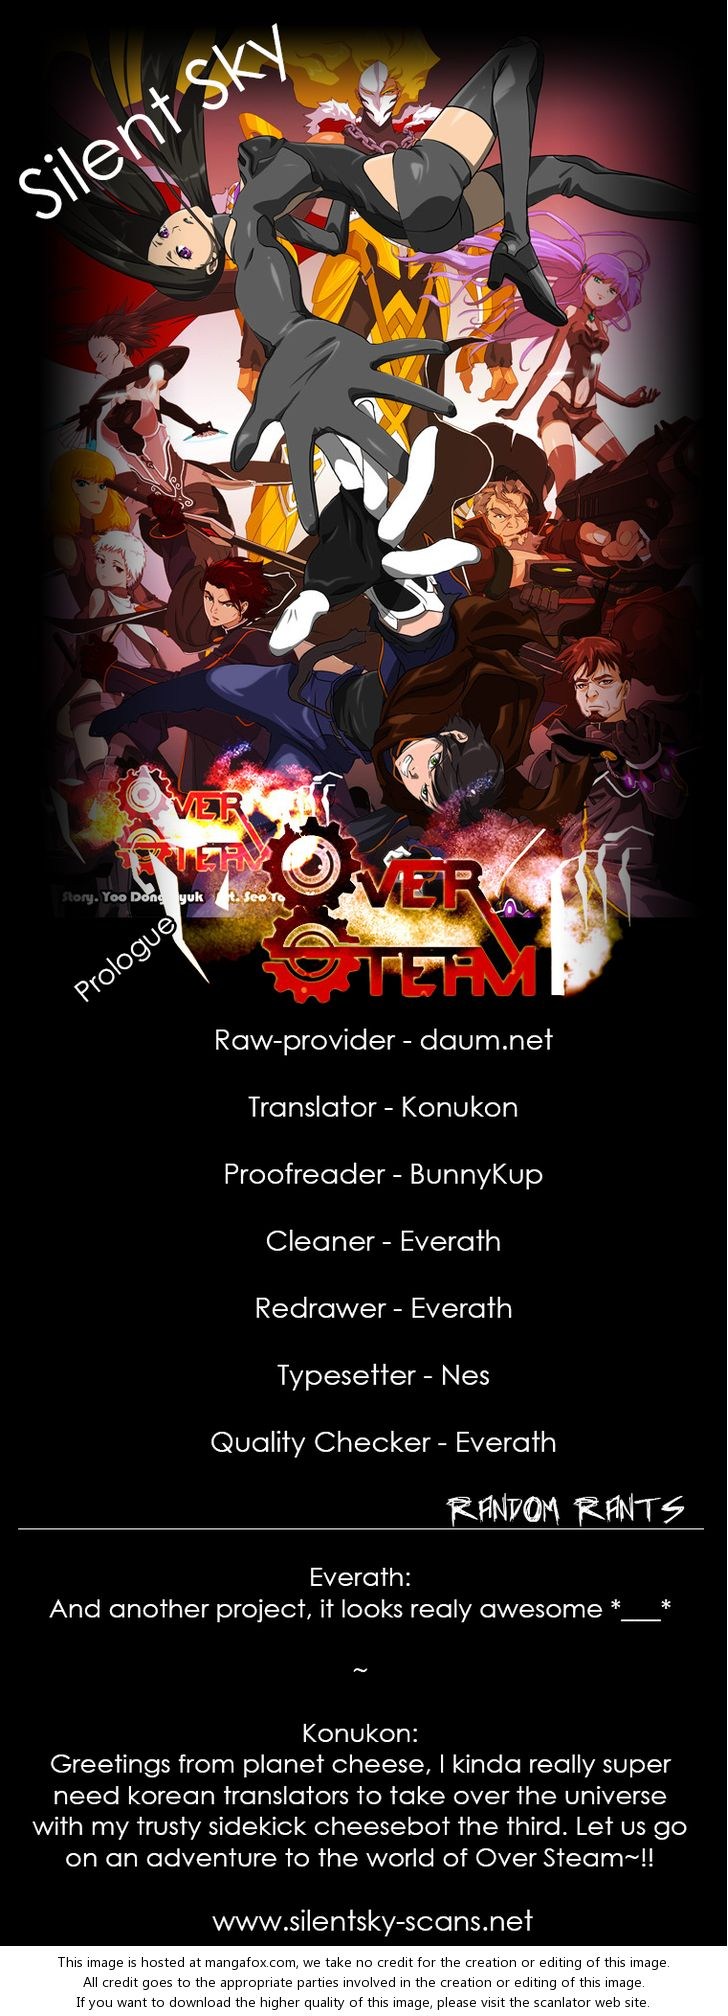 Over Steam 0 at MangaFox.la